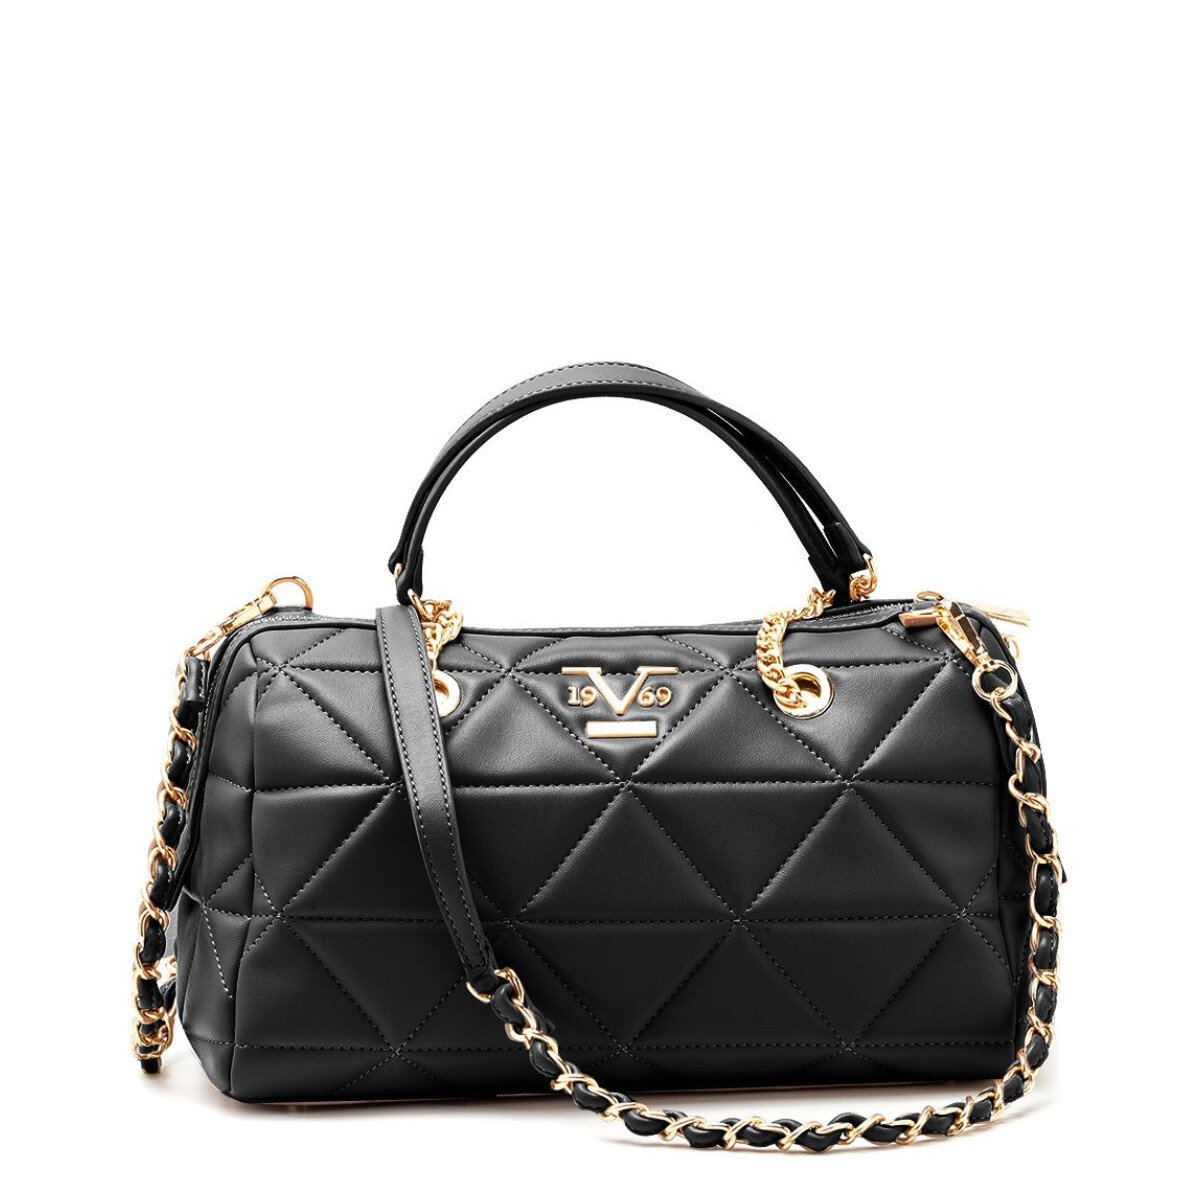 19v69 Italia Women's Handbag Various Colours 319004 - black UNICA